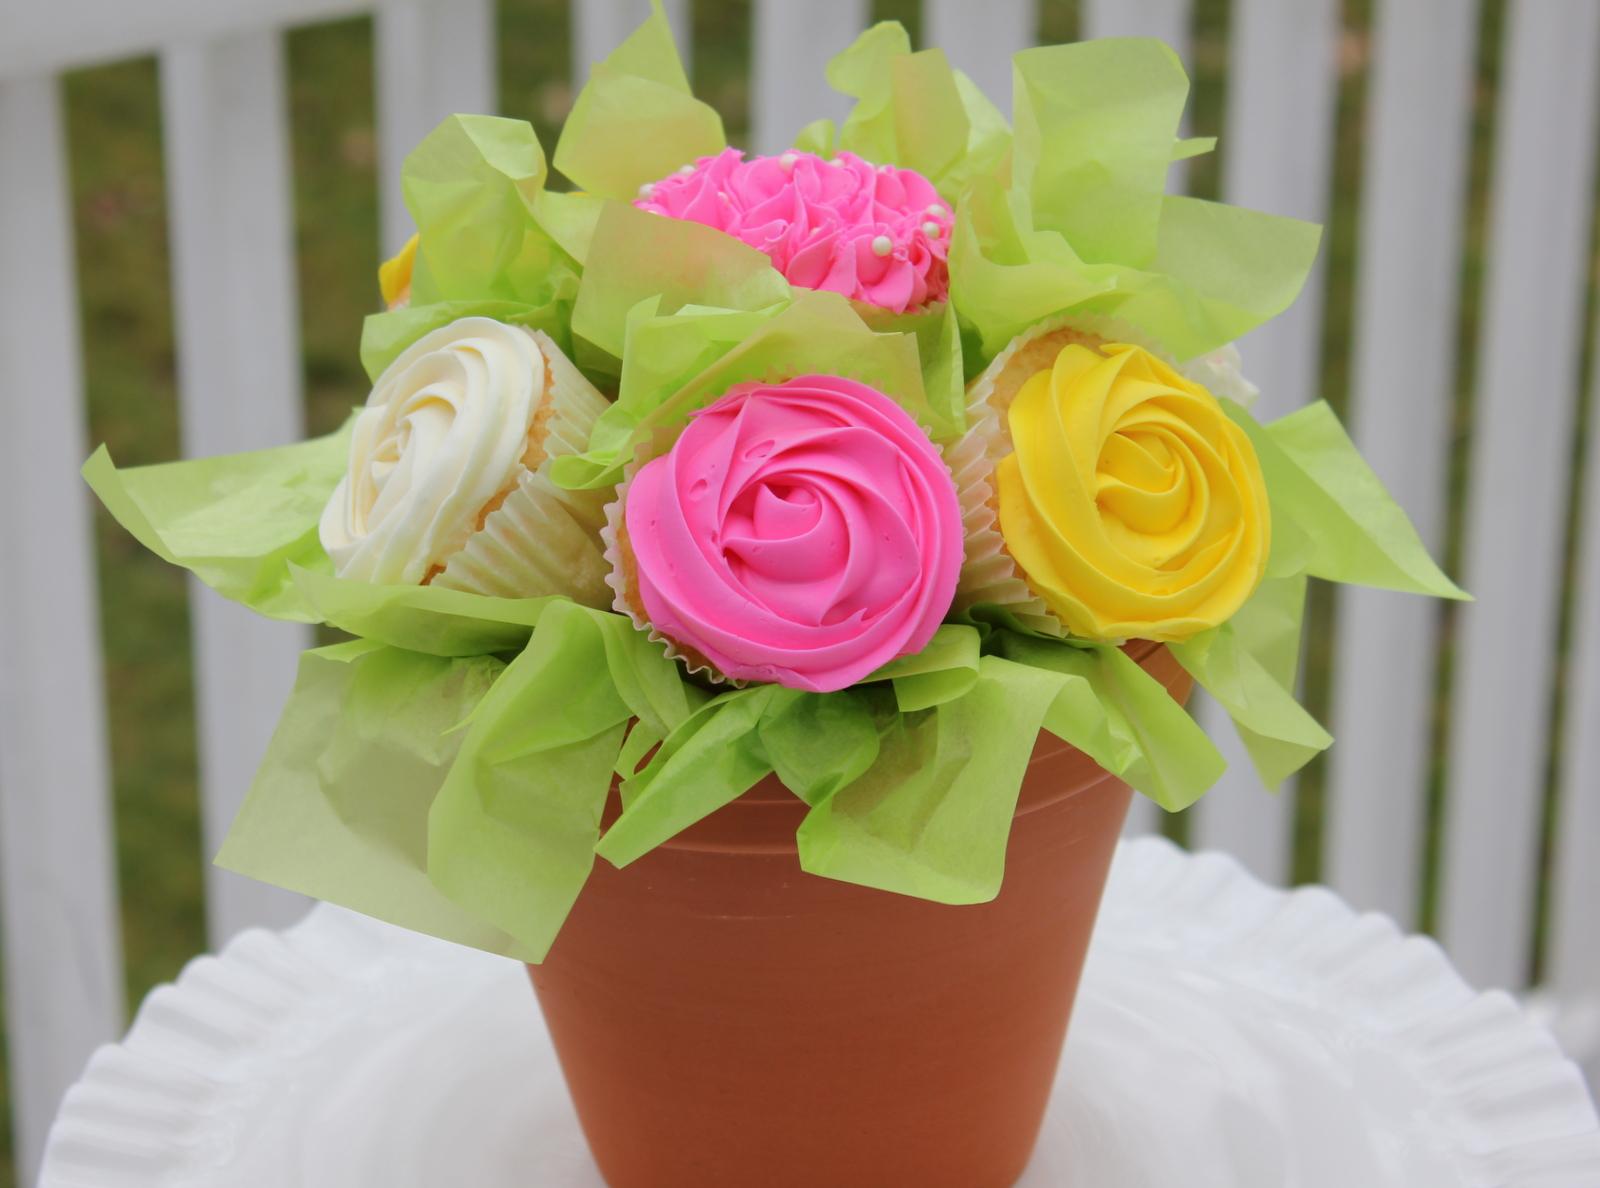 Punkie pies place cupcake flower bouquet cupcake flower bouquet izmirmasajfo